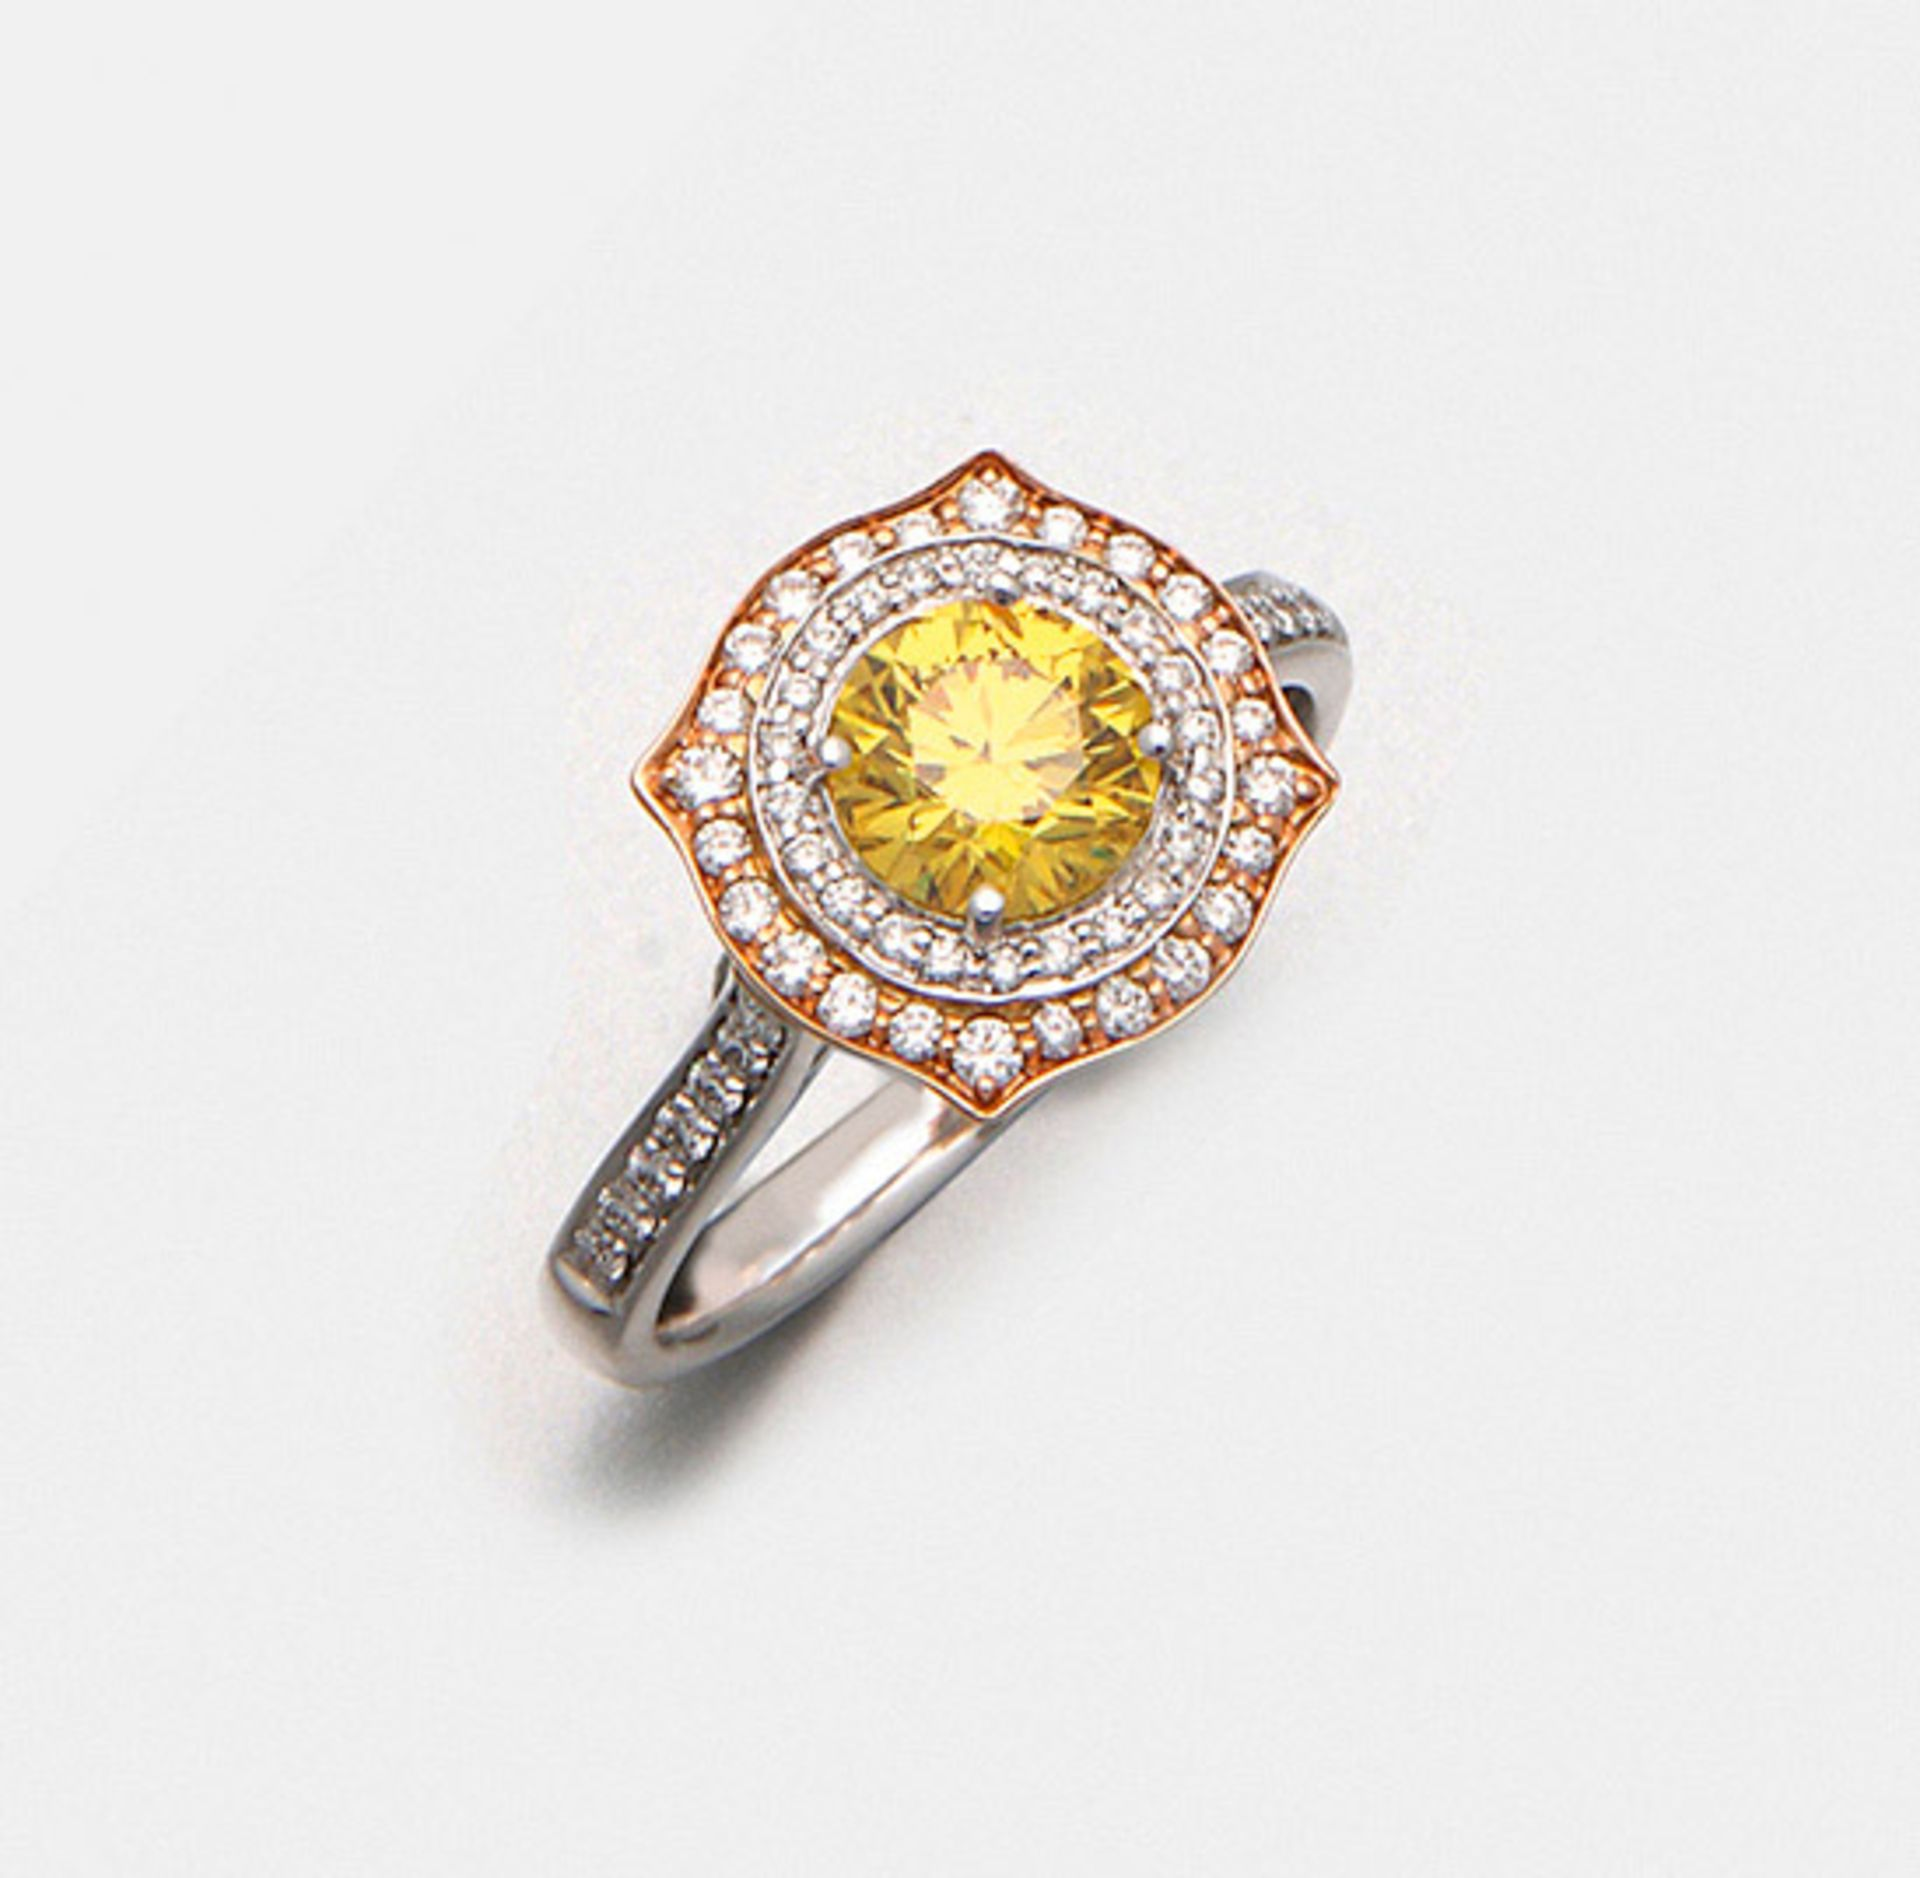 Eleganter Fancy-Vivid-Yellow-Brillantring